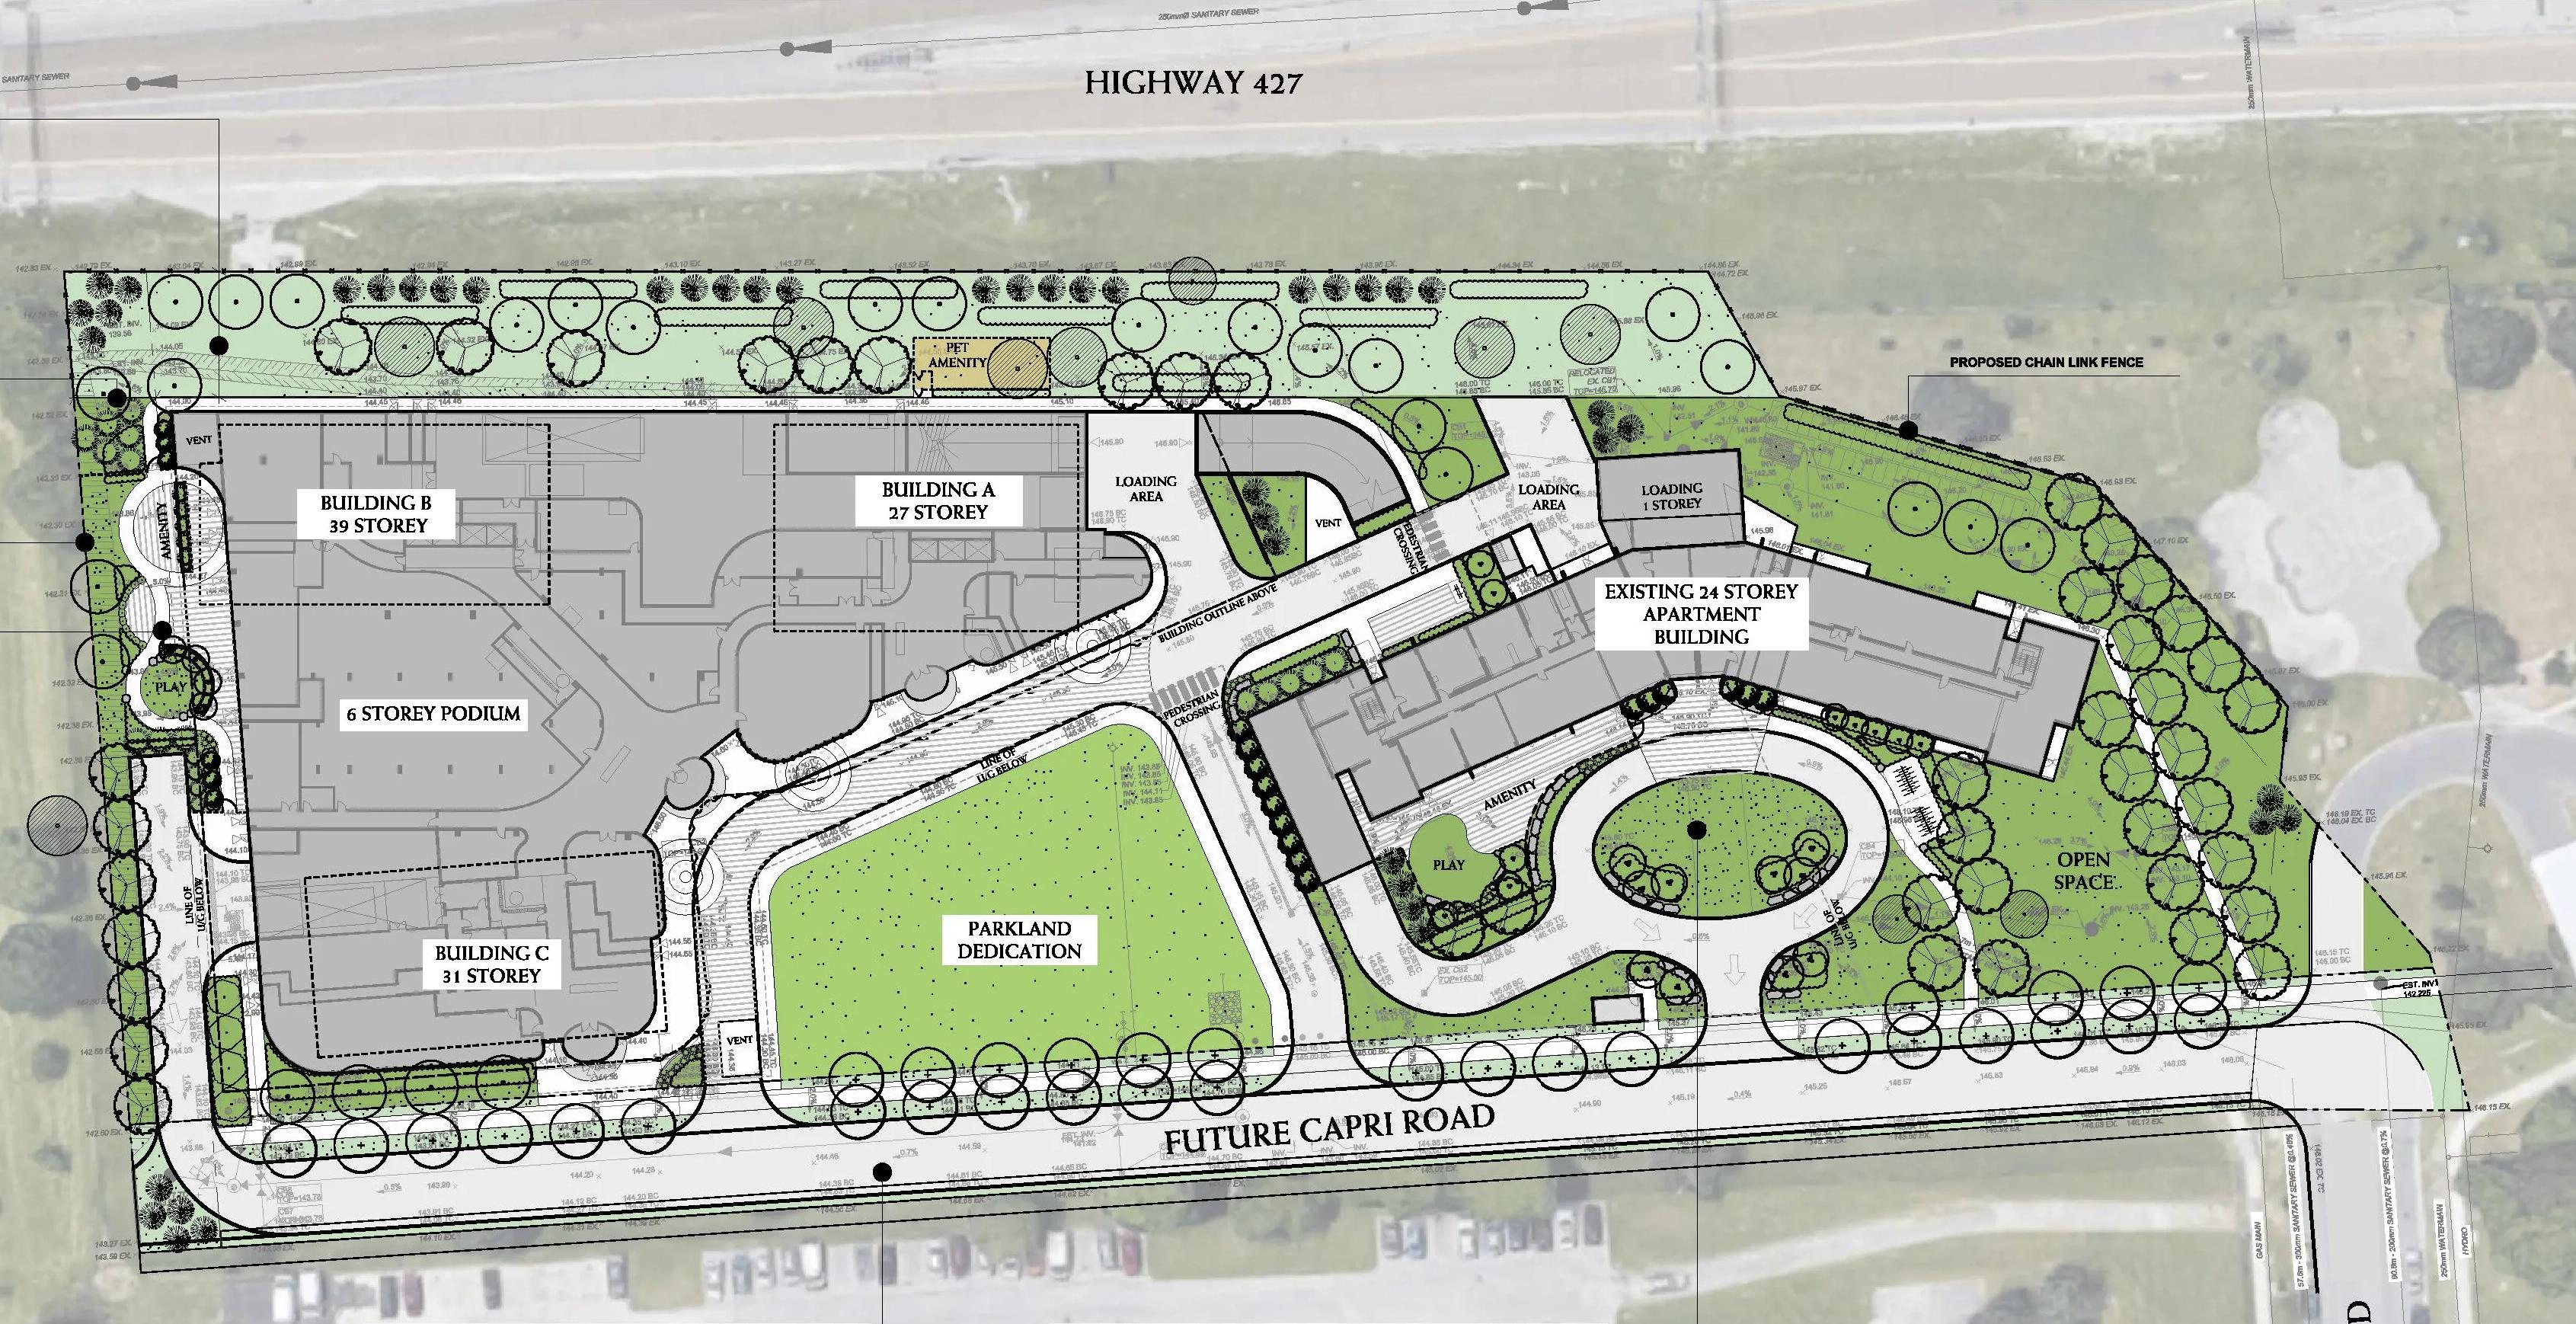 Site Plan, 5 Capri Road, Etobicoke, Toronto, designed by BDP Quadrangle for Tenblock